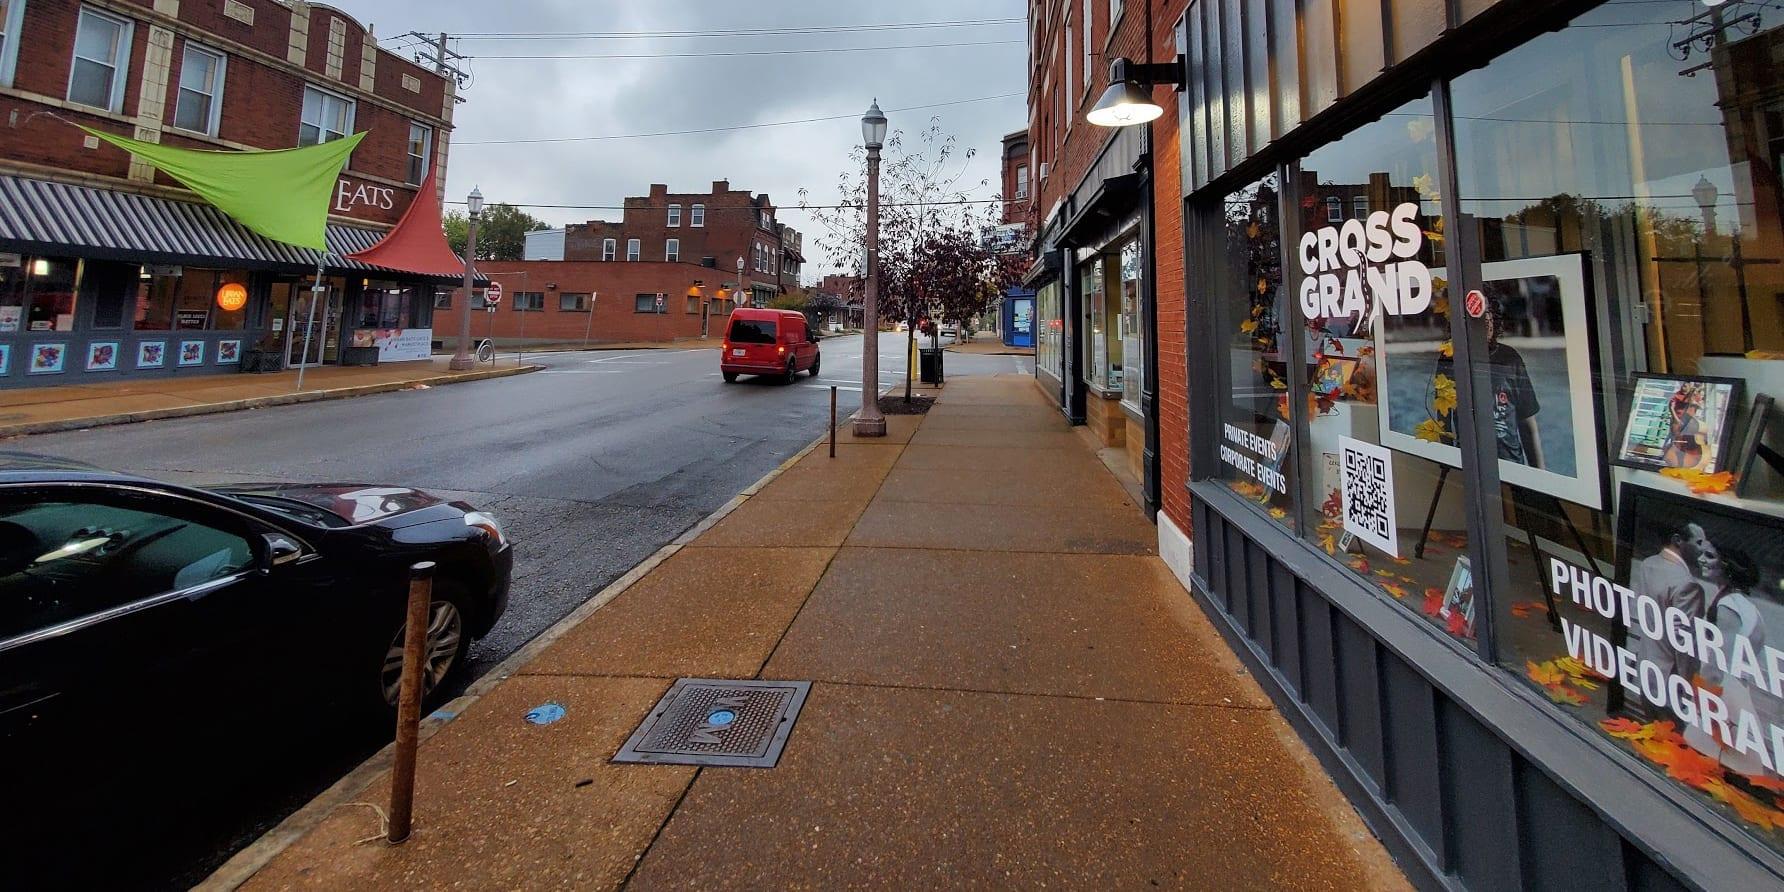 Cross Grand's studio at 3304 Meramec Street in Downtown Dutchtown.